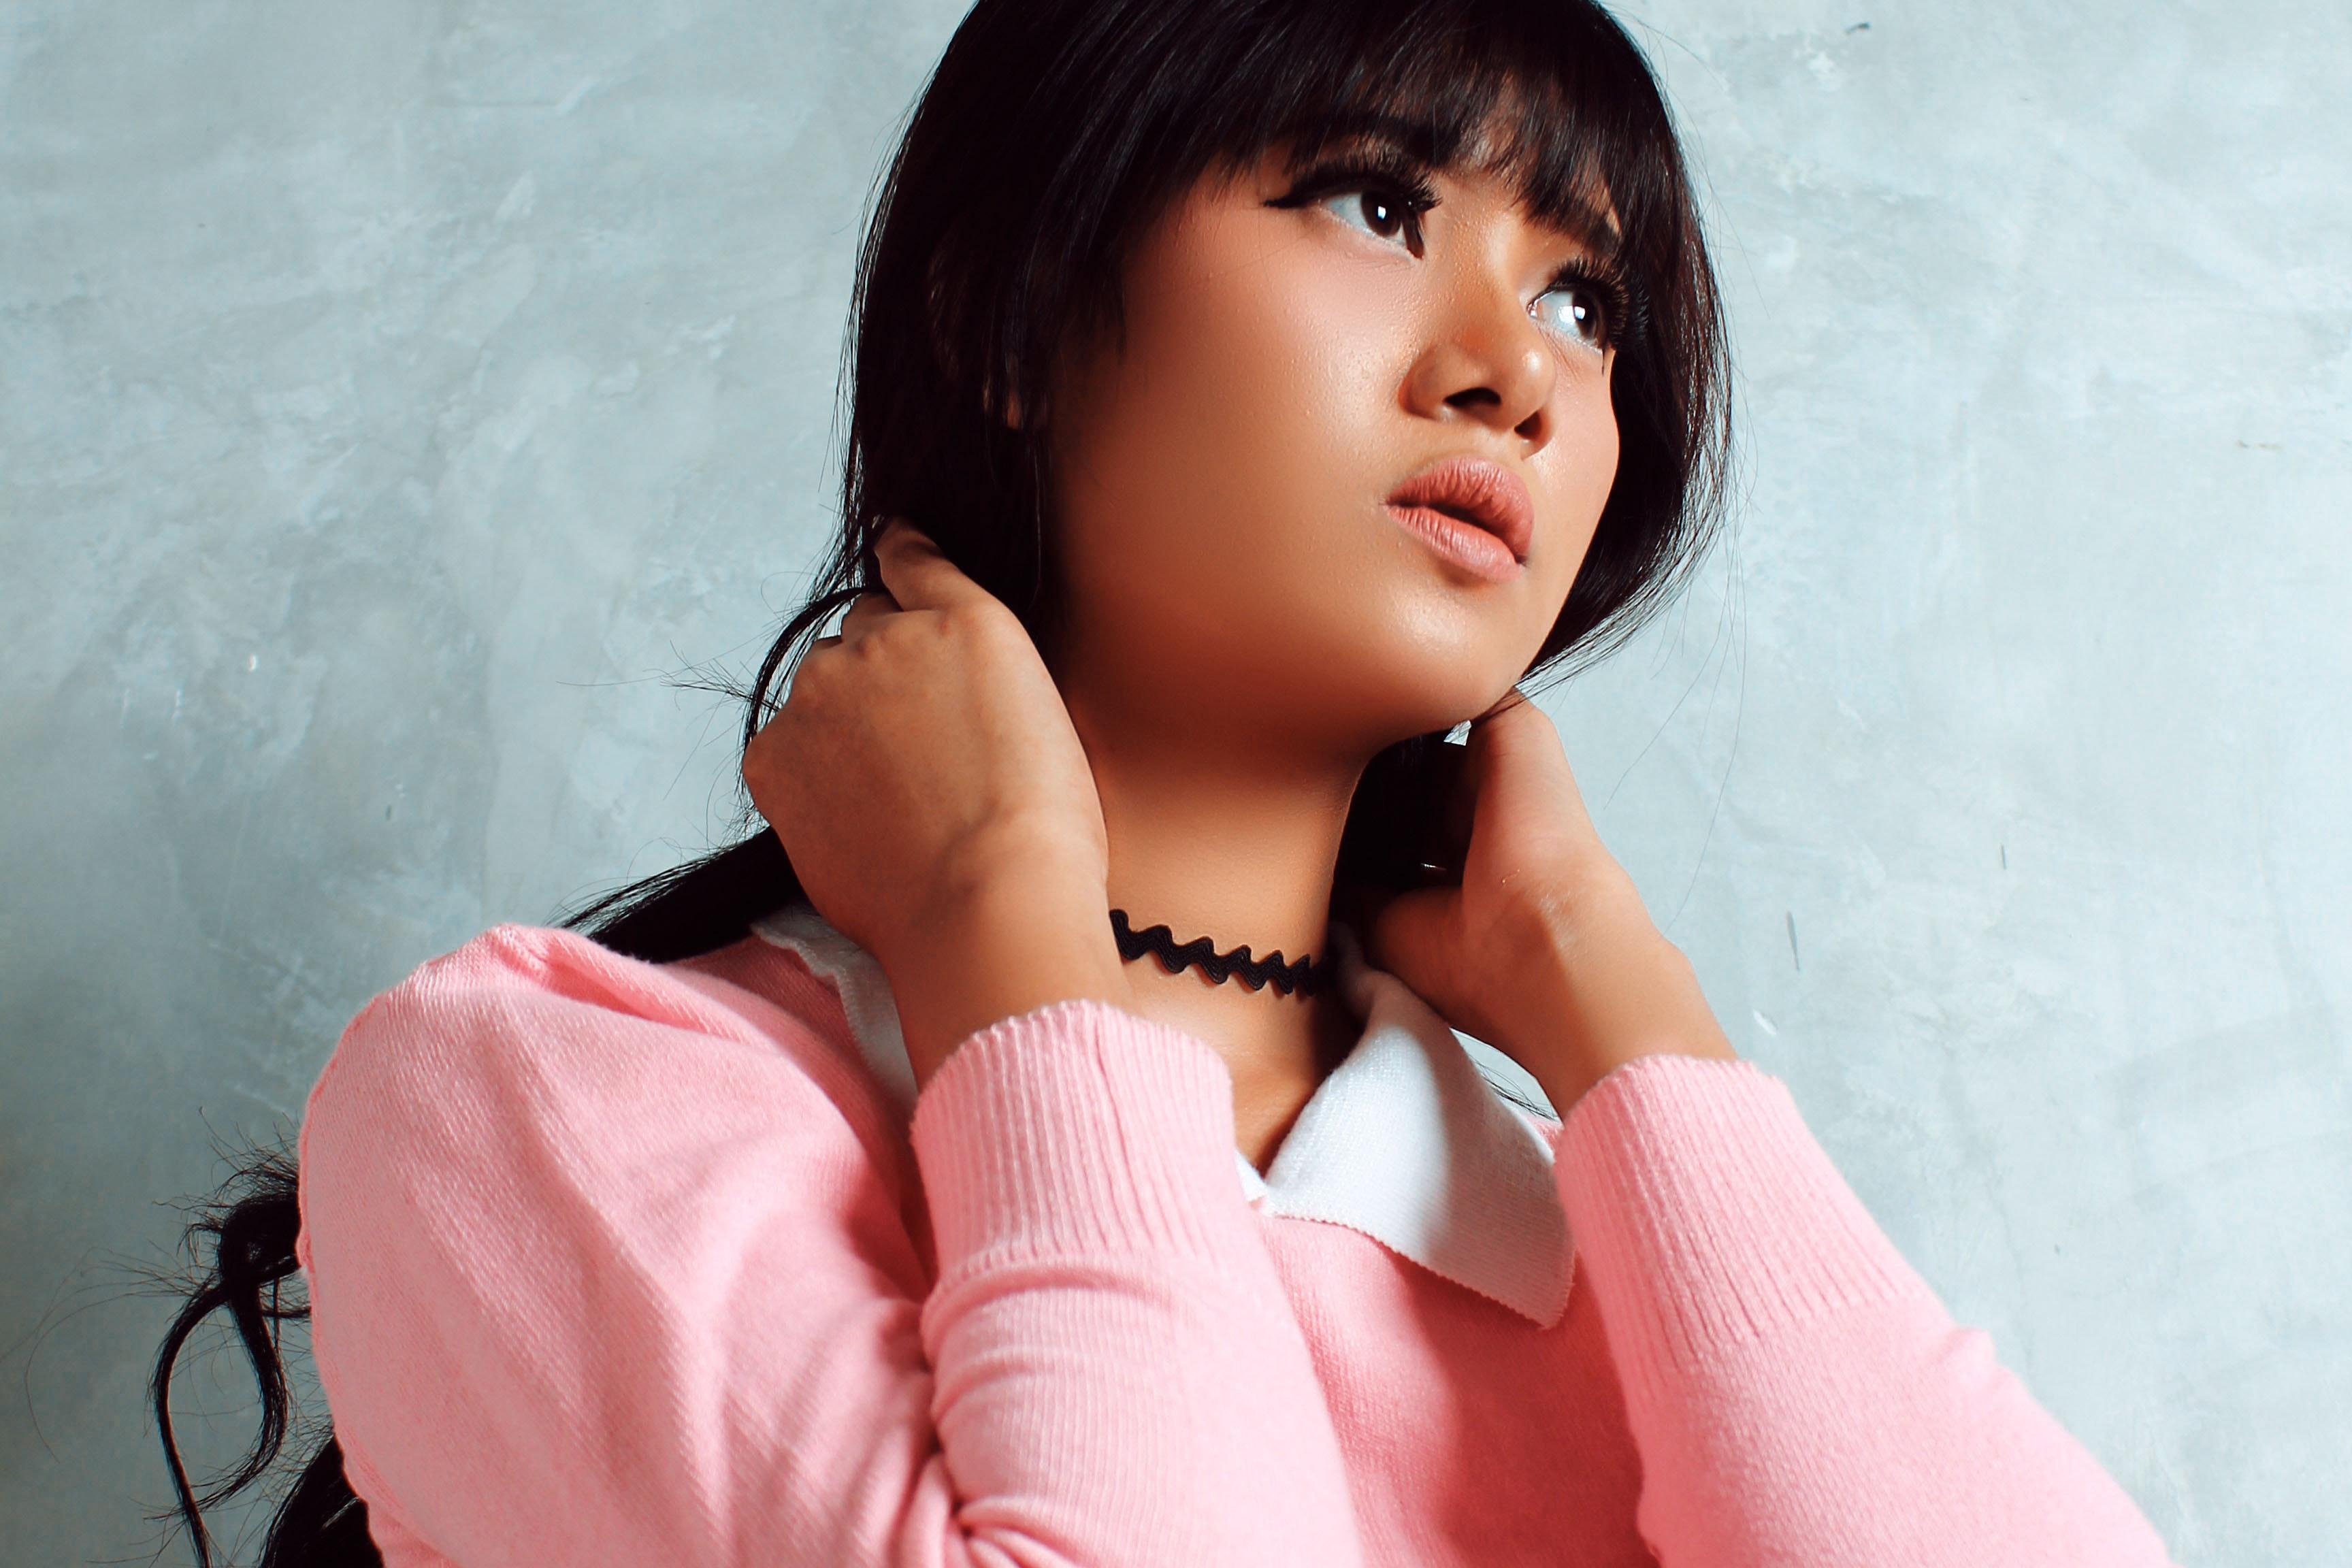 Fotoğraf Cilt Pembe Güzellik Kız Siyah Saç Kahverengi Saç